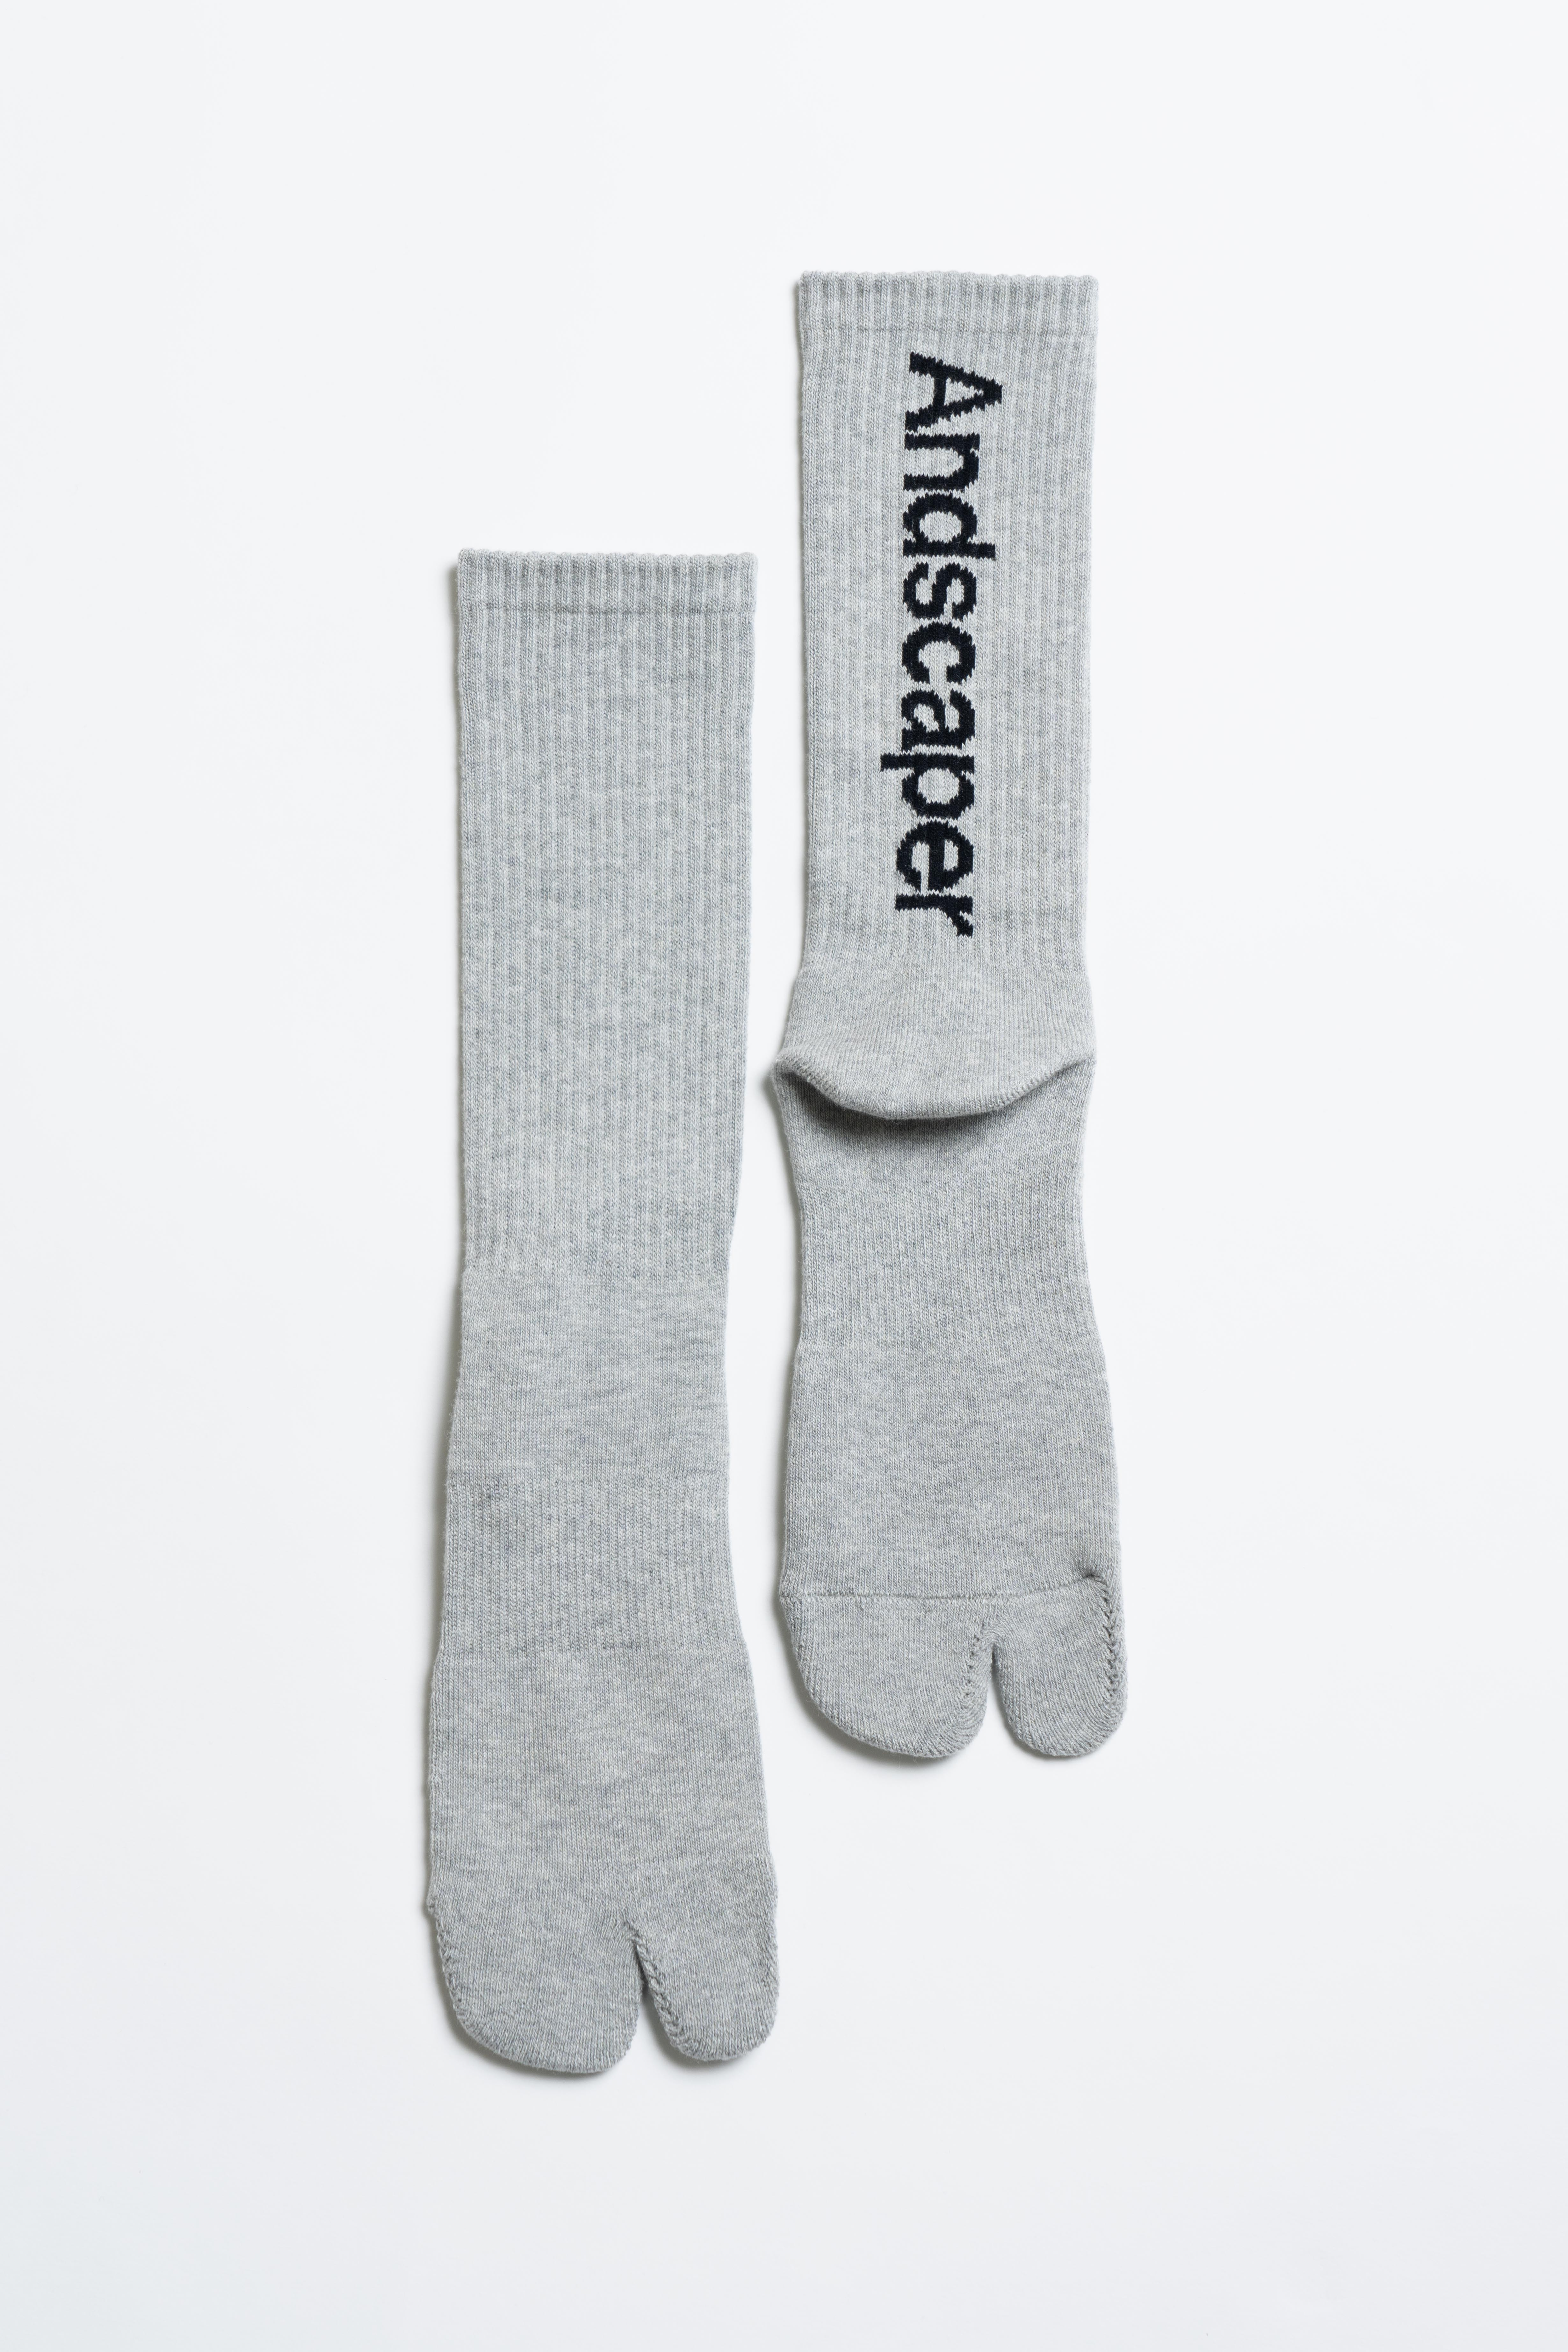 Concept Logo Socks(Gray × Black)